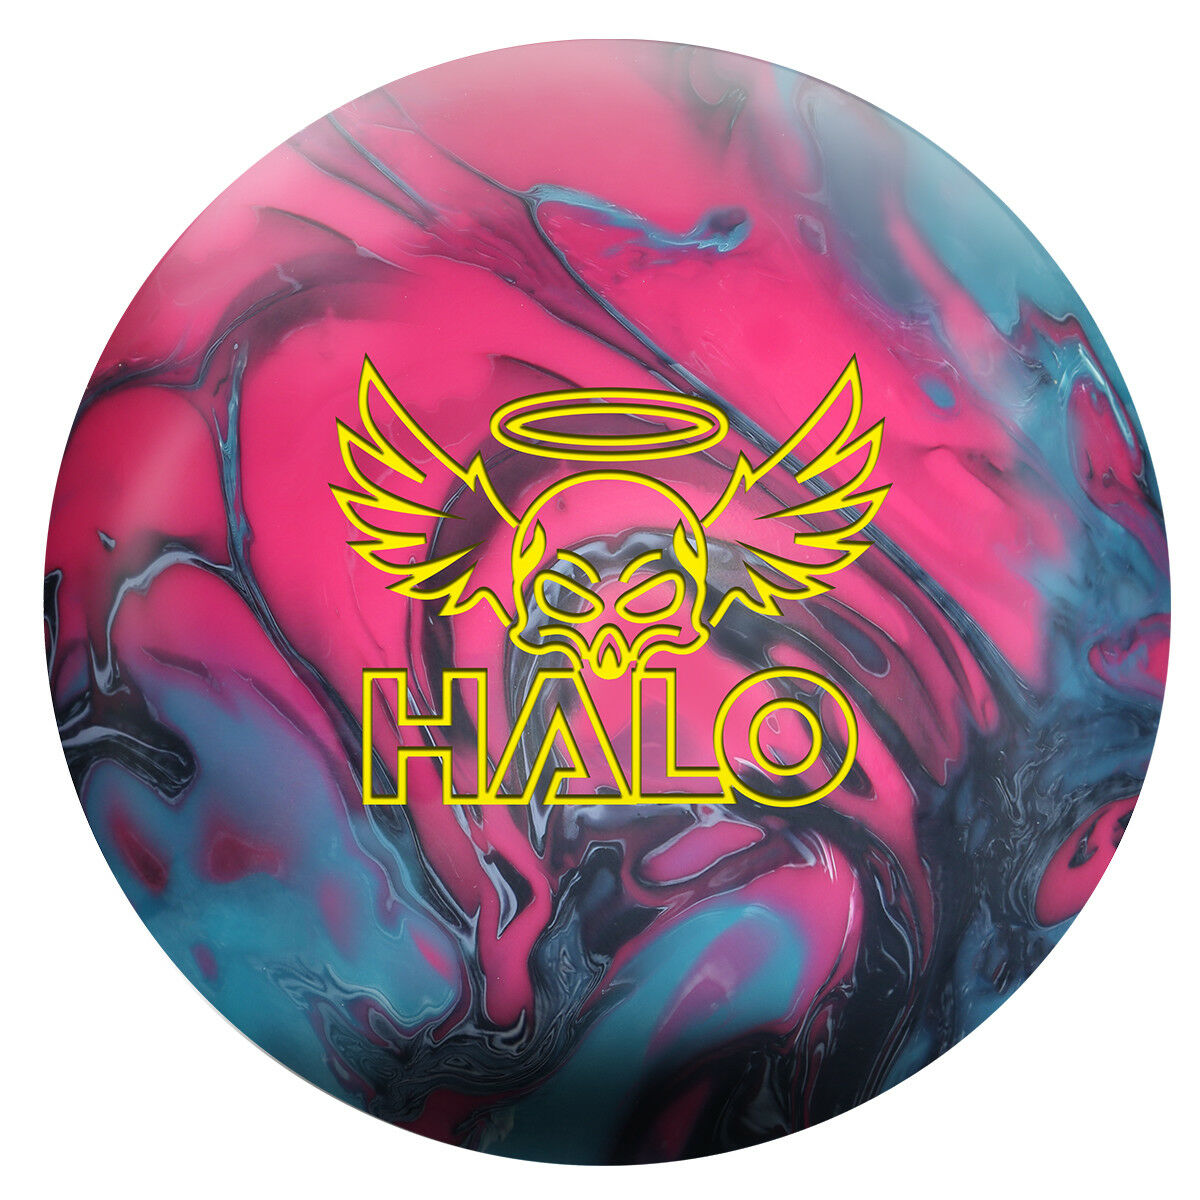 16lb redo Grip Halo Bowling Ball